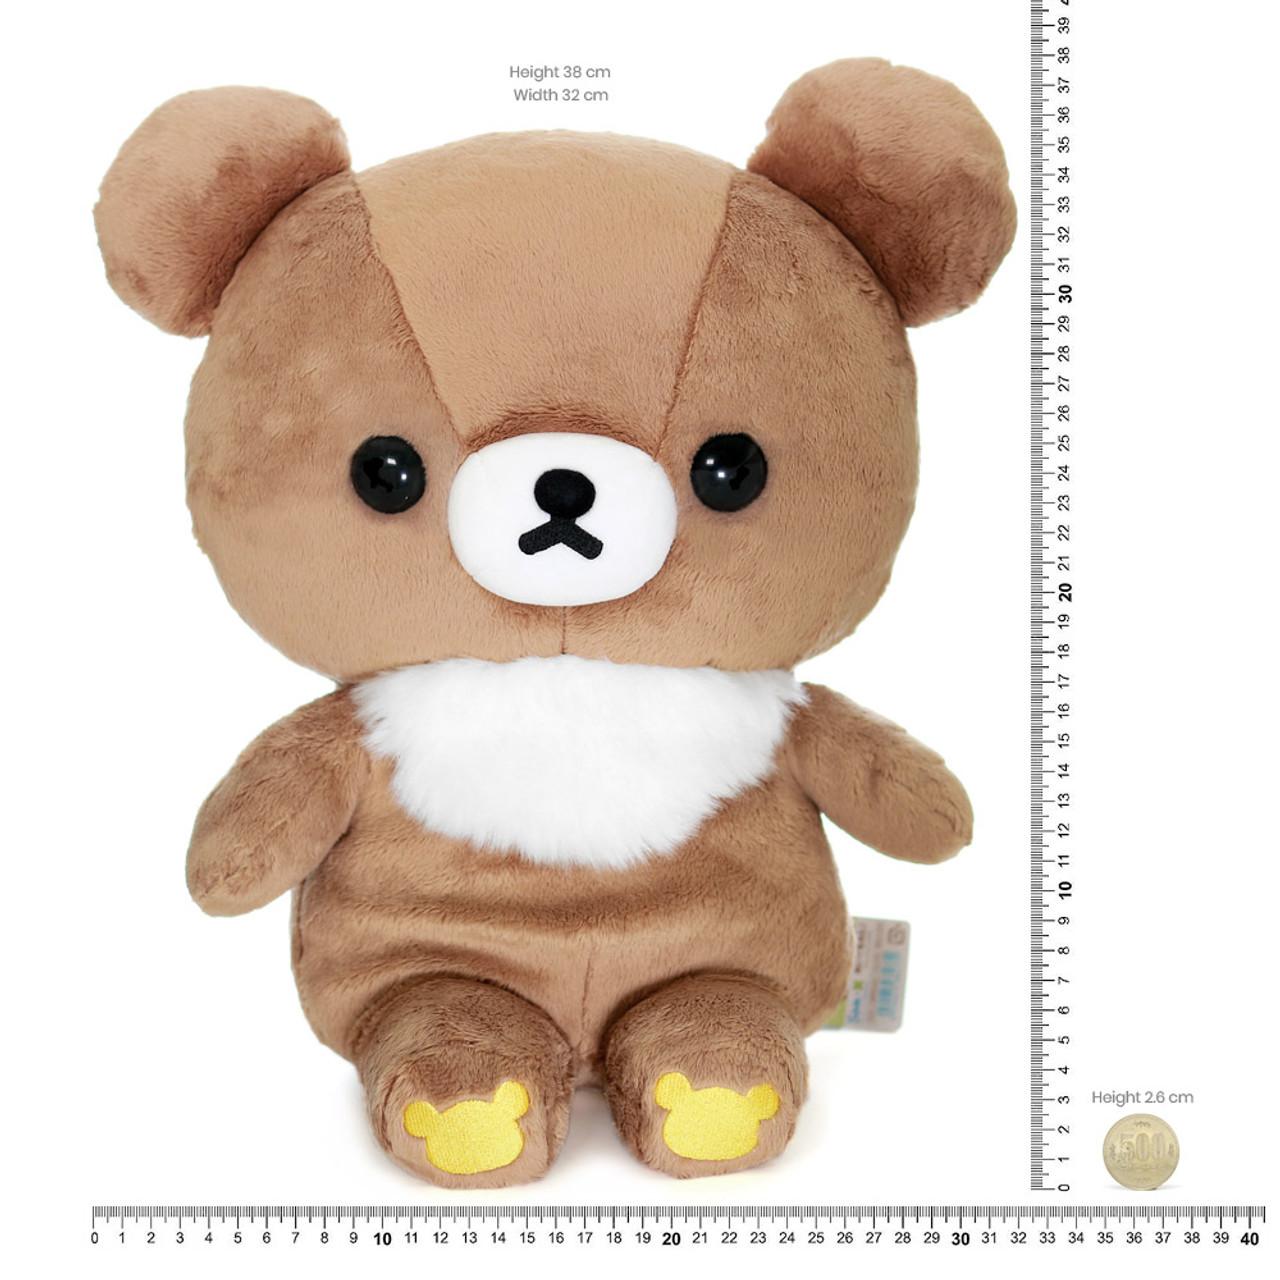 San-x Cute Sweet Chairoikoguma Bear Stuffed Animal Toy L MR94401 ( Proportion )